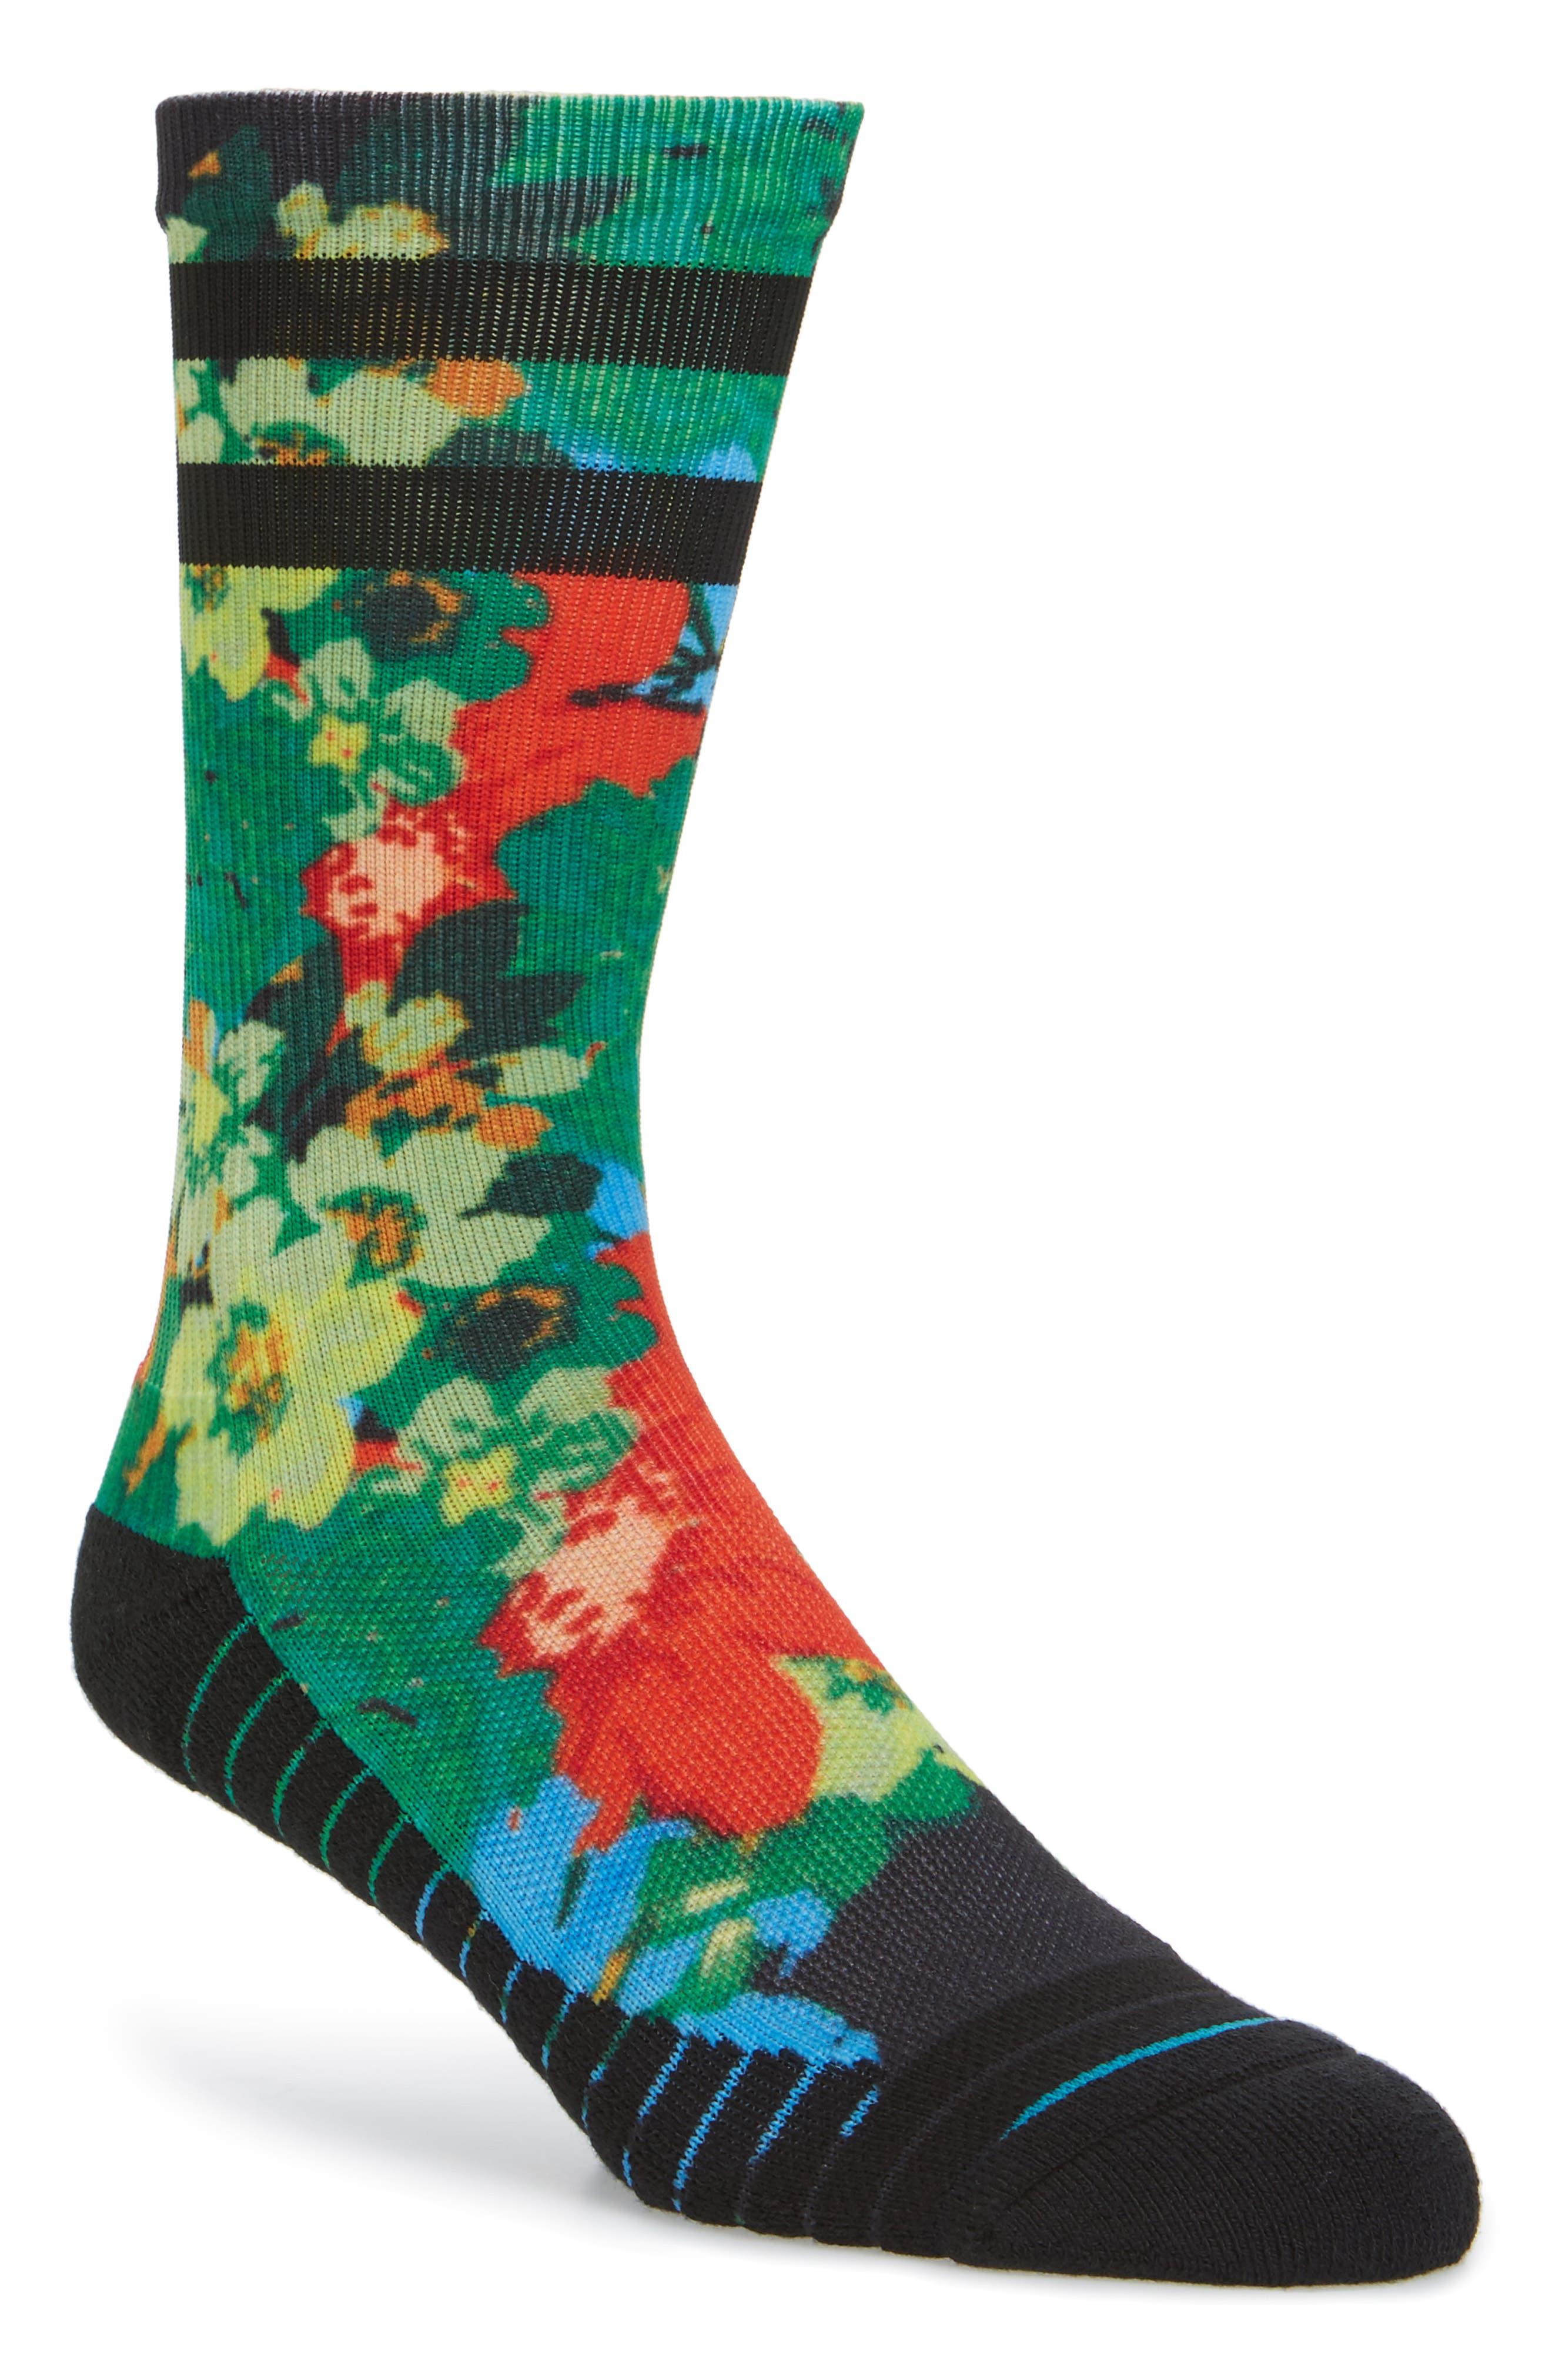 Alternate Image 1 Selected - Stance Frandrop Crew Socks